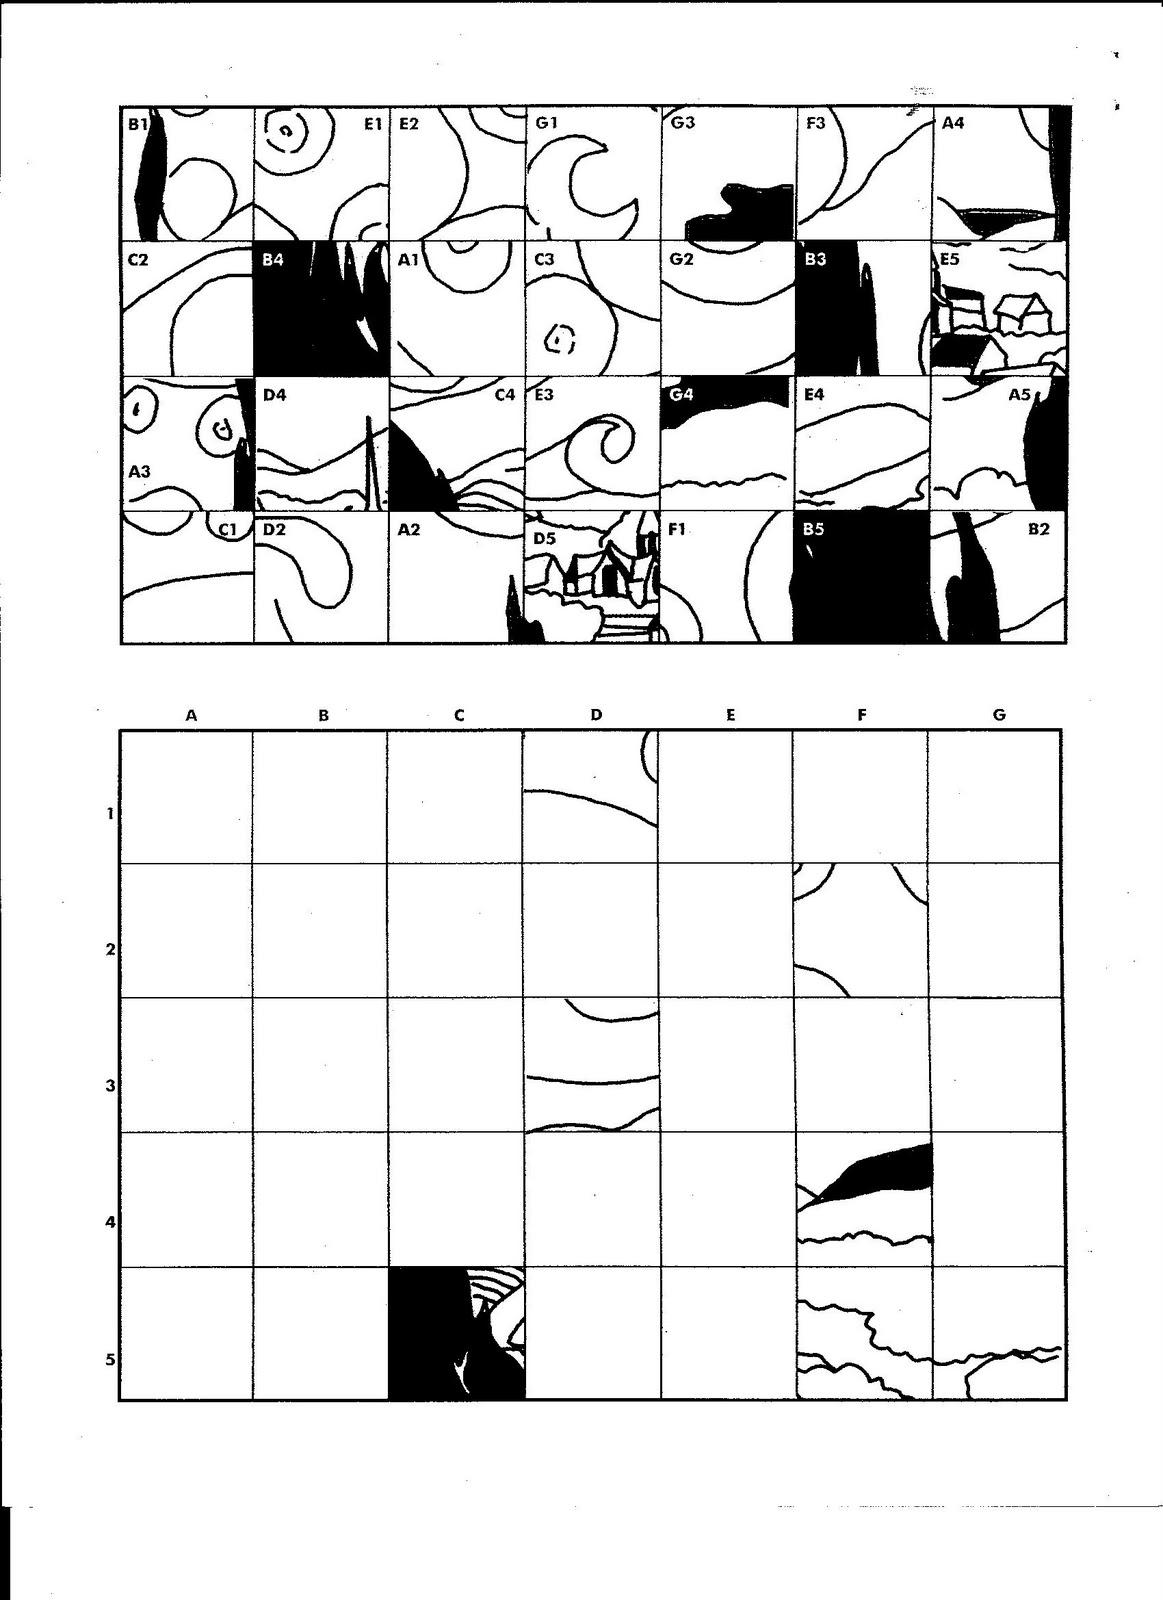 High School Art Worksheets Free Worksheets Library